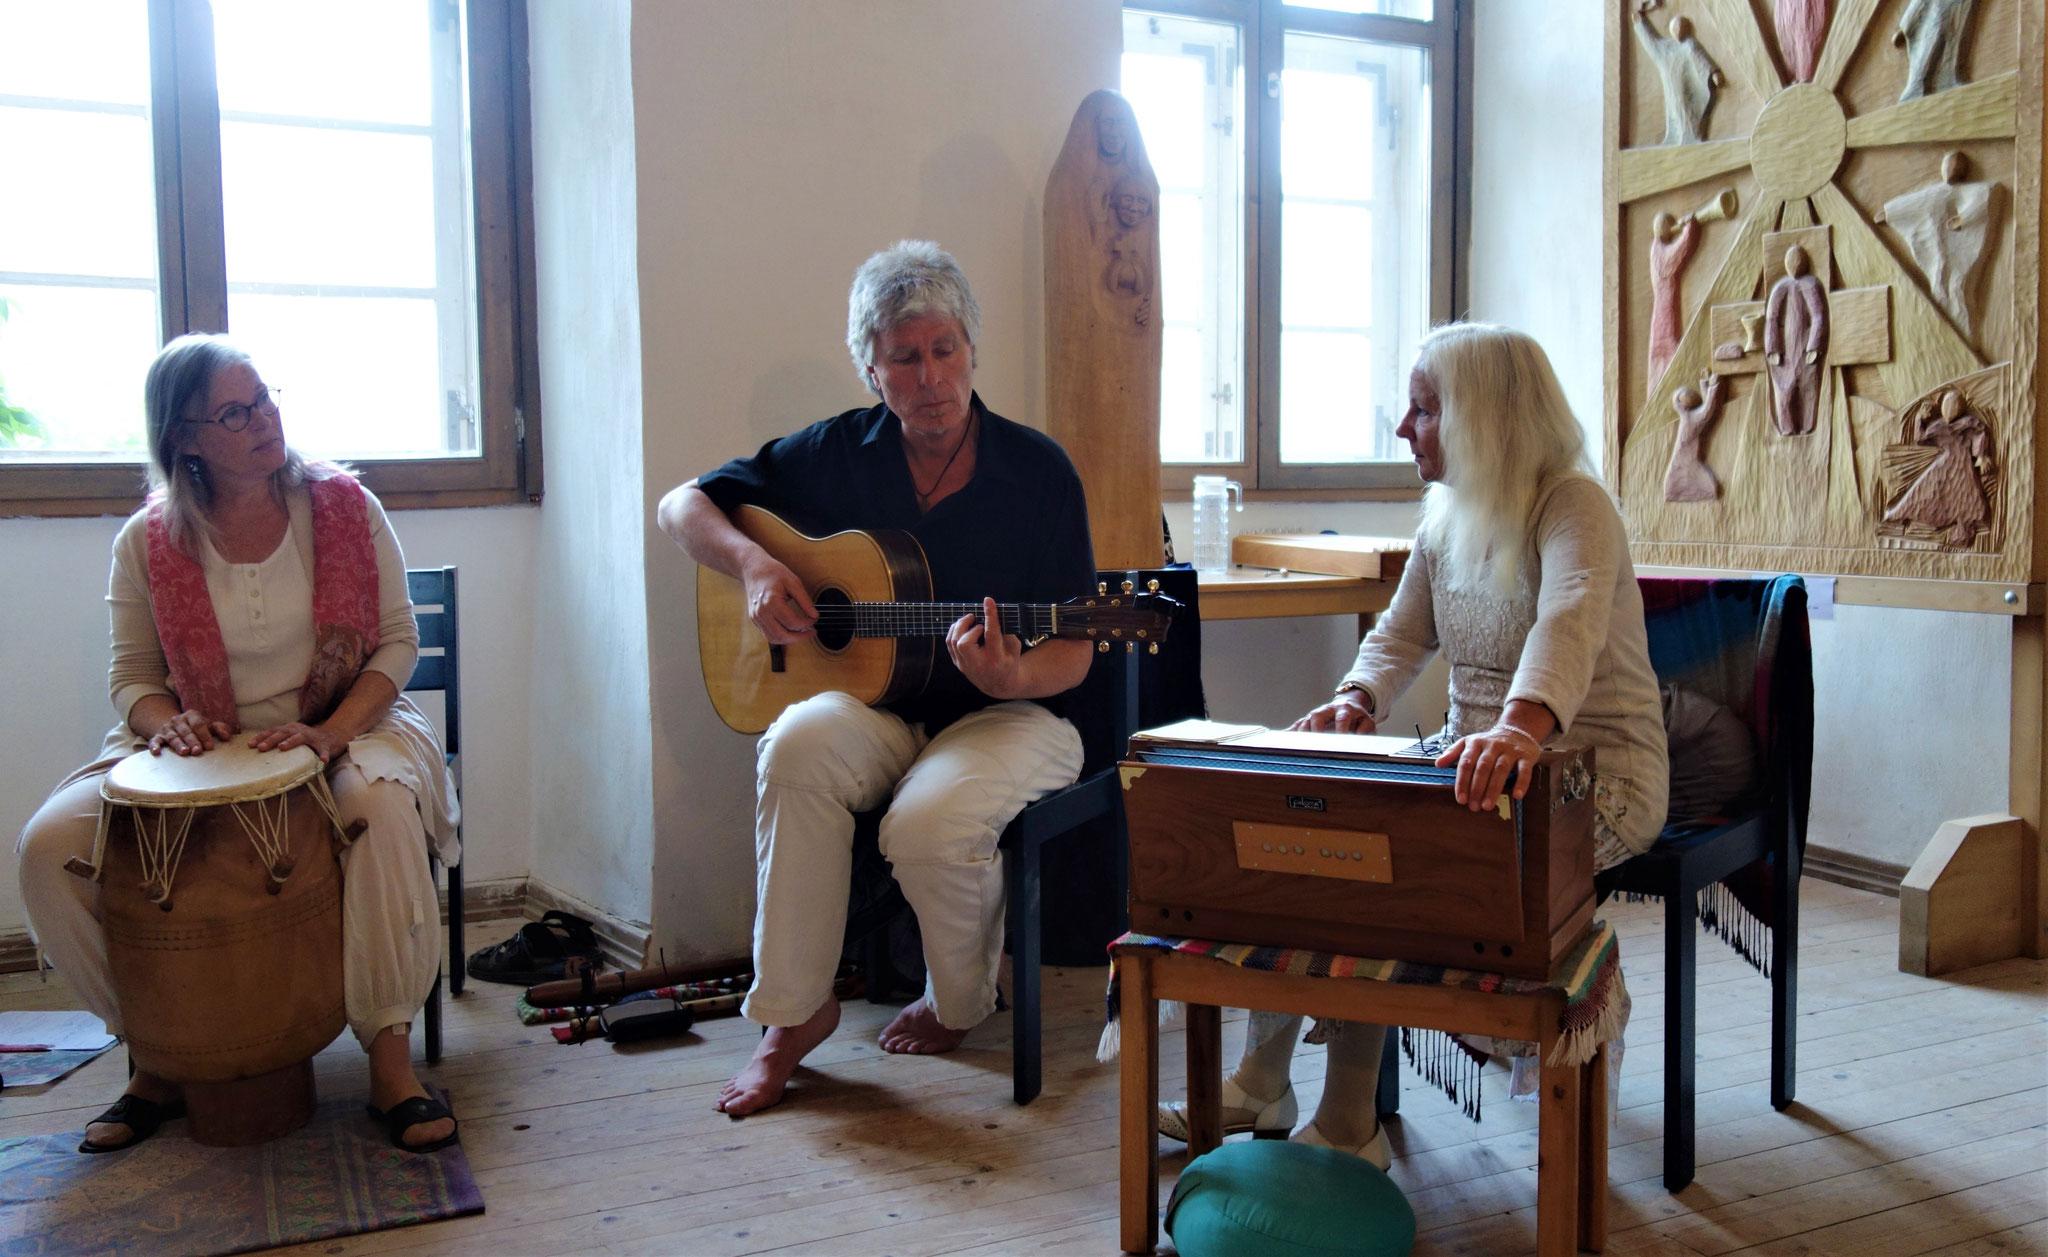 Meditatives Singen und Klanggebete aus dem Herzen des Trios MUSIKAVIVA (Sophia Becker, Roland Foresta, Ursula Shalina Kanitz). Foto: Jennifer Peppler